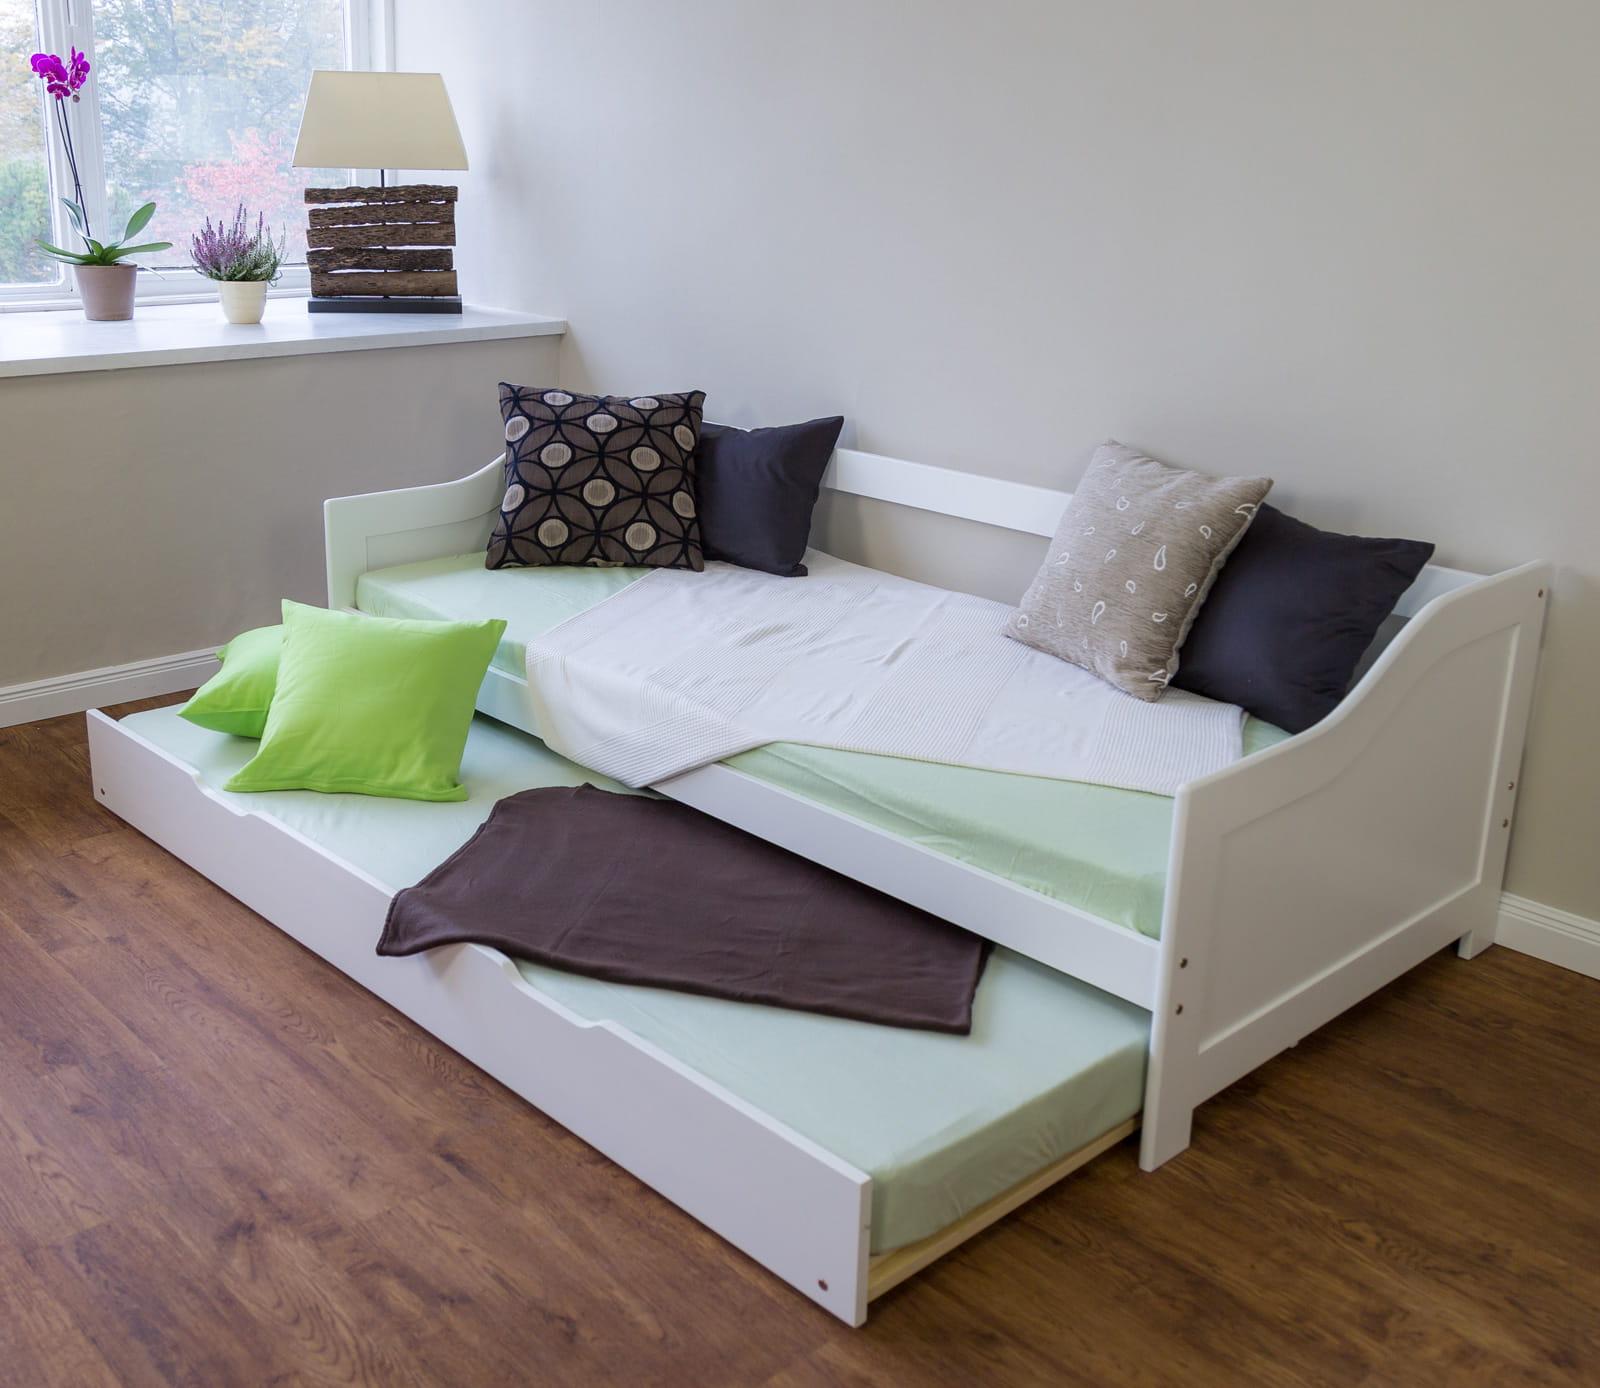 ko m odzie owe 90x200 cm rozk adane bia e sklep. Black Bedroom Furniture Sets. Home Design Ideas